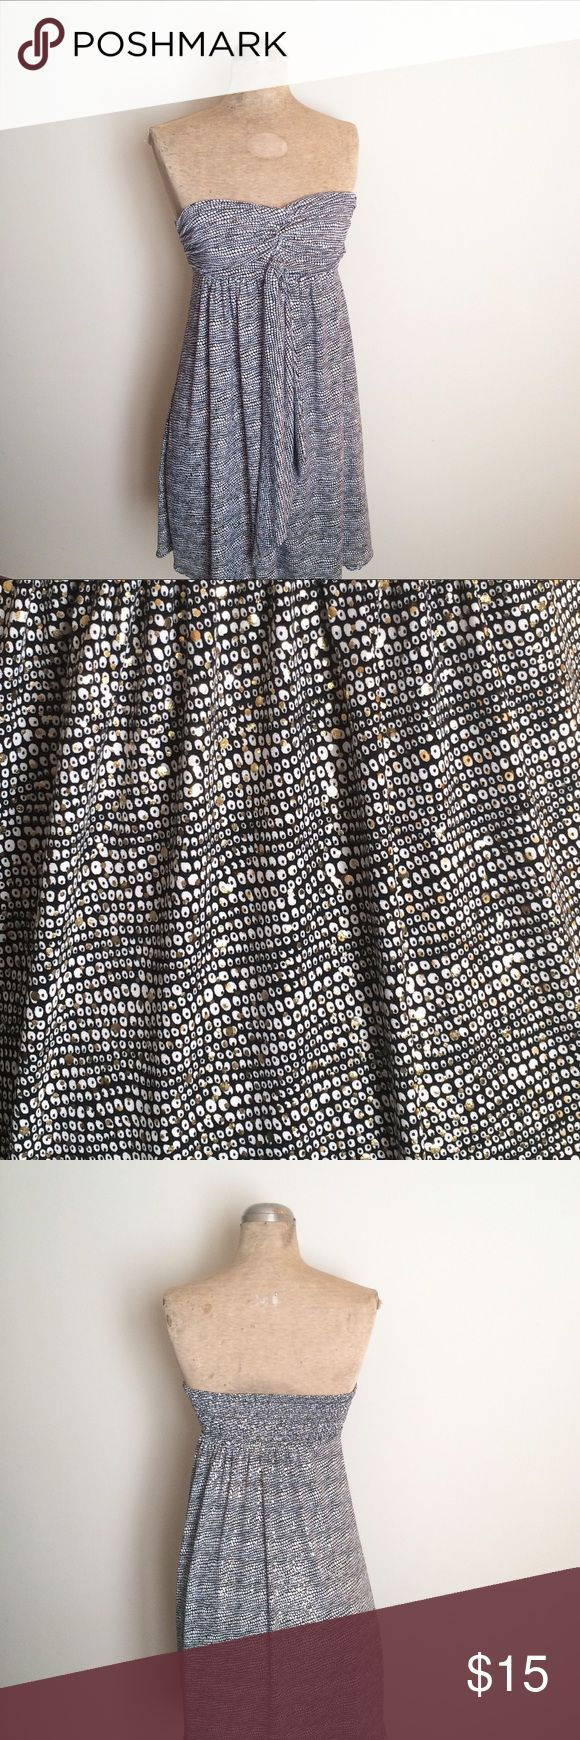 EXPRESS black white gold speckled tube top dress EXPRESS black white gold speckled tube top dress. Express Dresses Midi